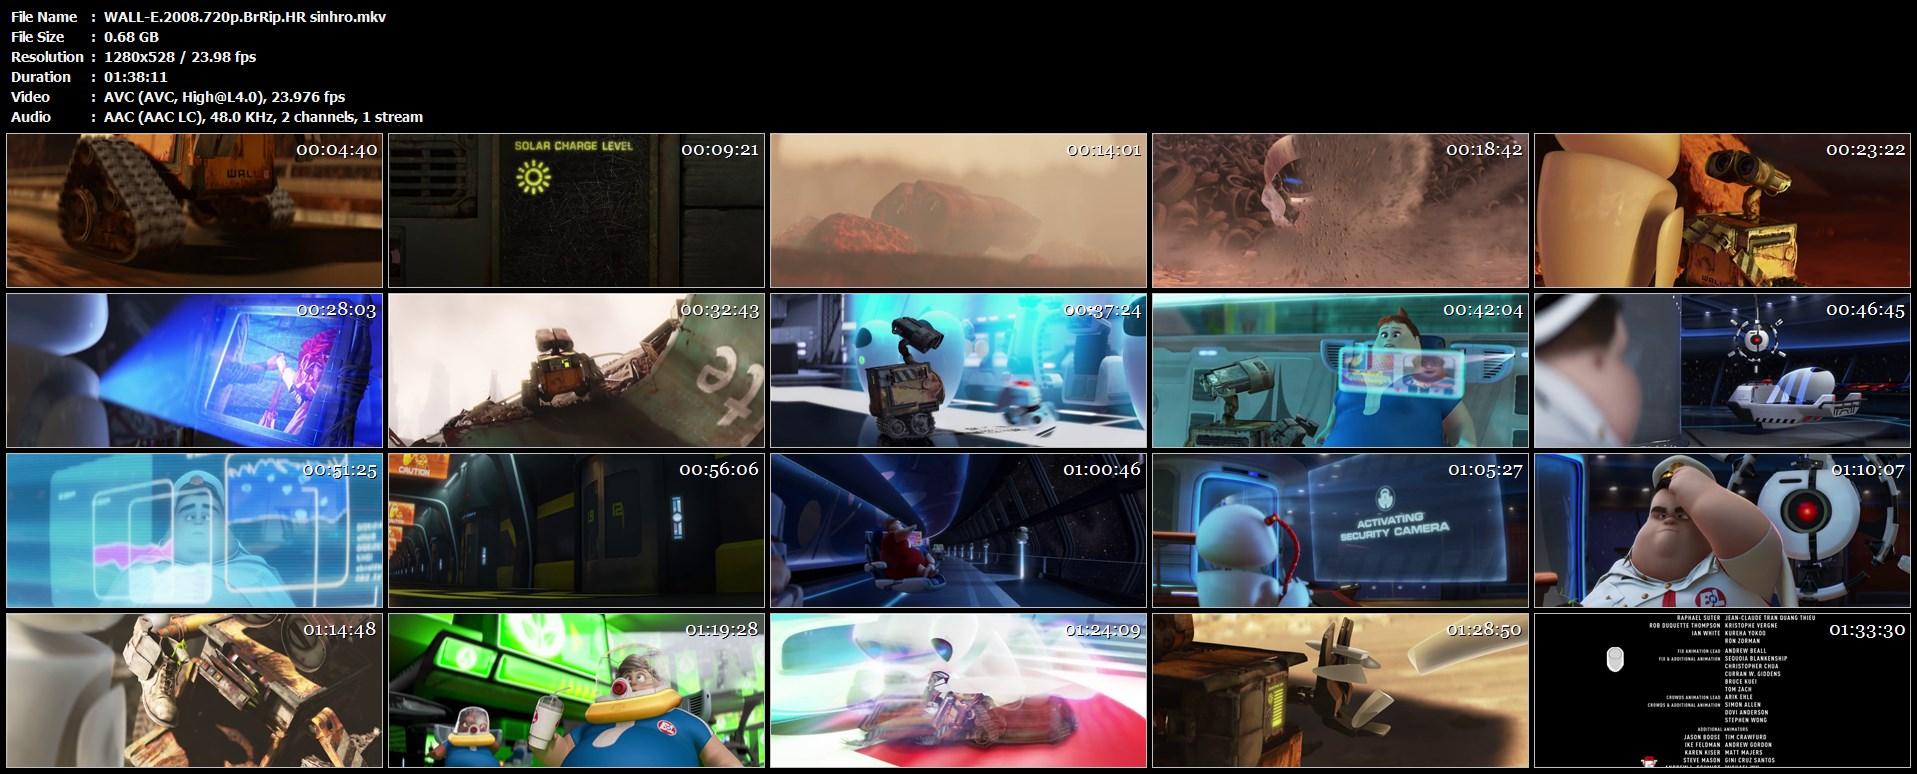 WALL-E2008720pBrRipHR_sinhromkv.jpg